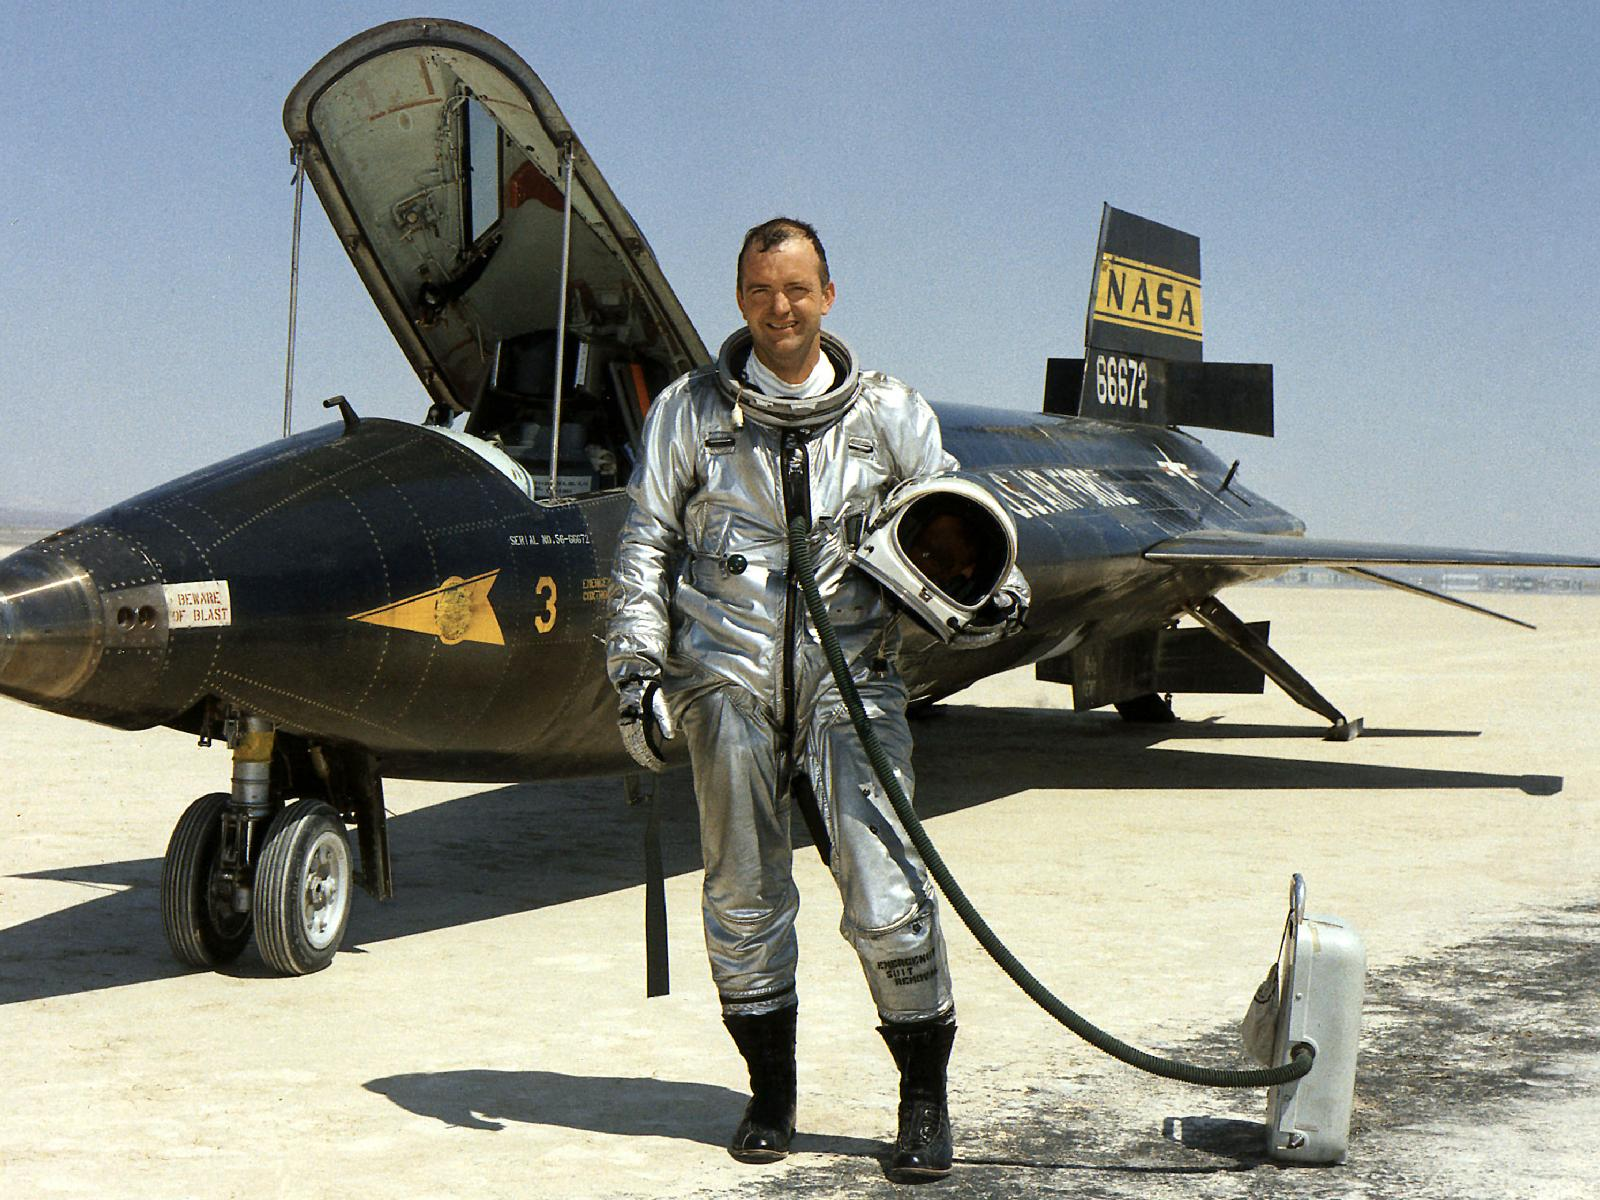 NASA's Bill Dana Next to X-15